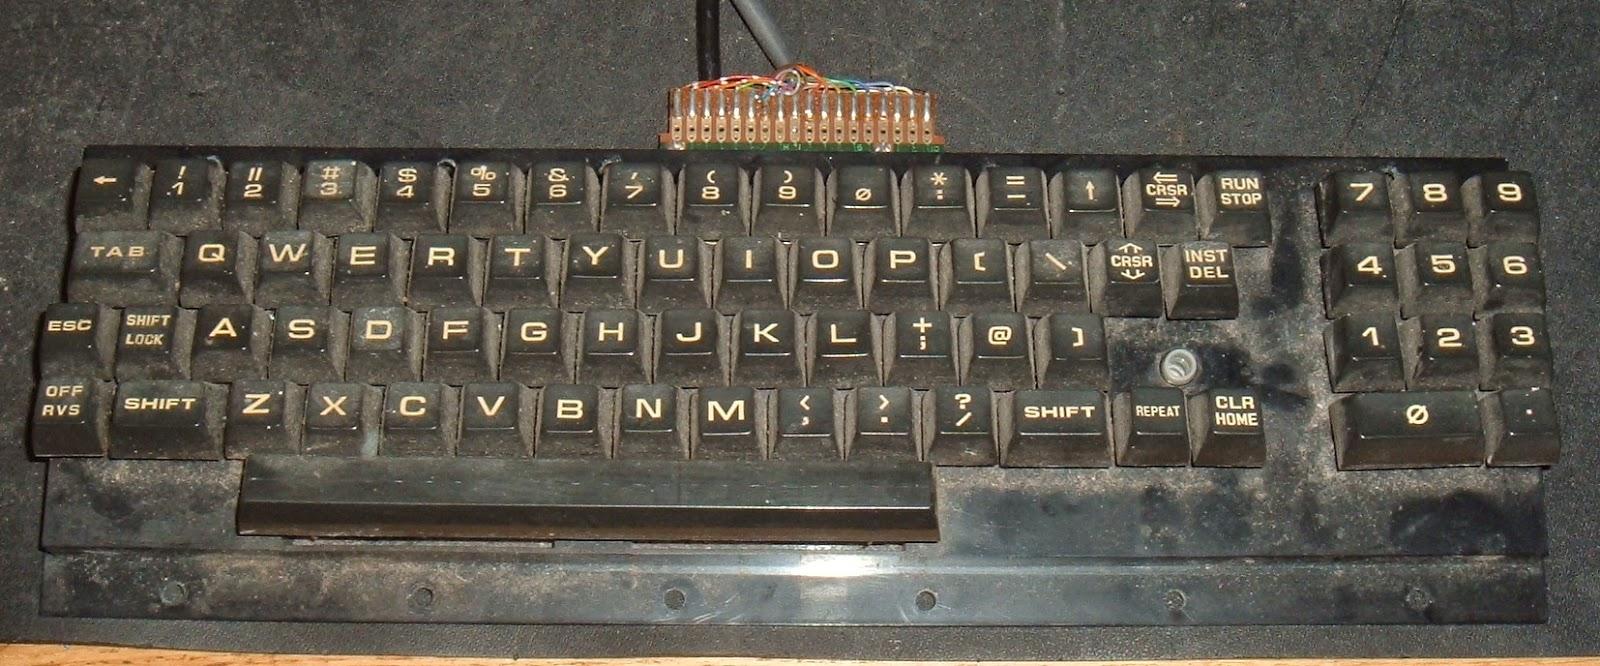 Tynemouth Software: Commodore Pet Repair Part 8 - Keyboard